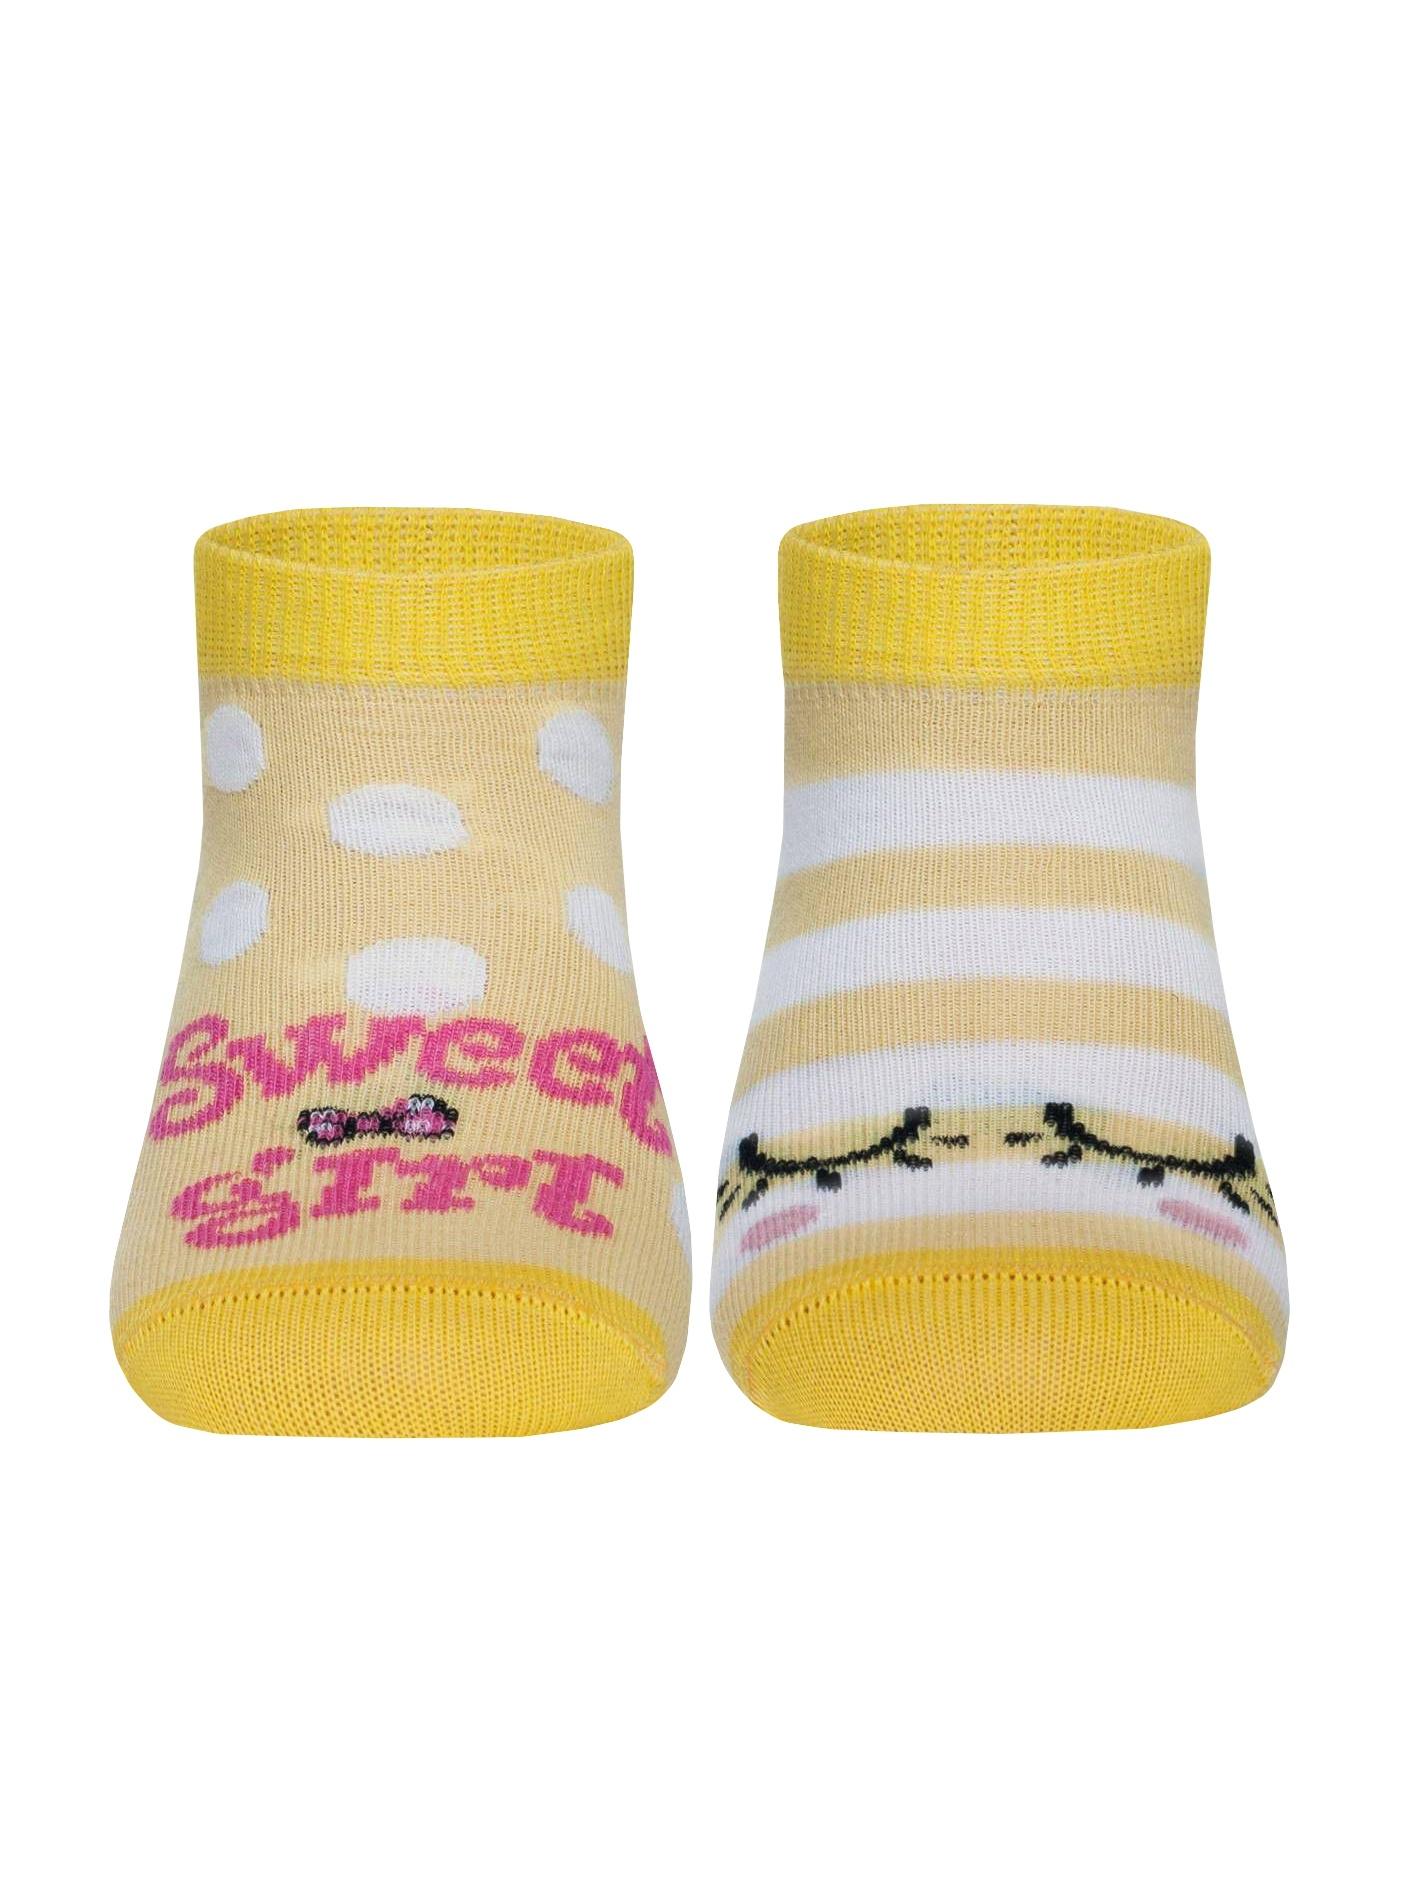 Носки носки детские soxo черепашка цвет бежевый 84858 размер 19 21